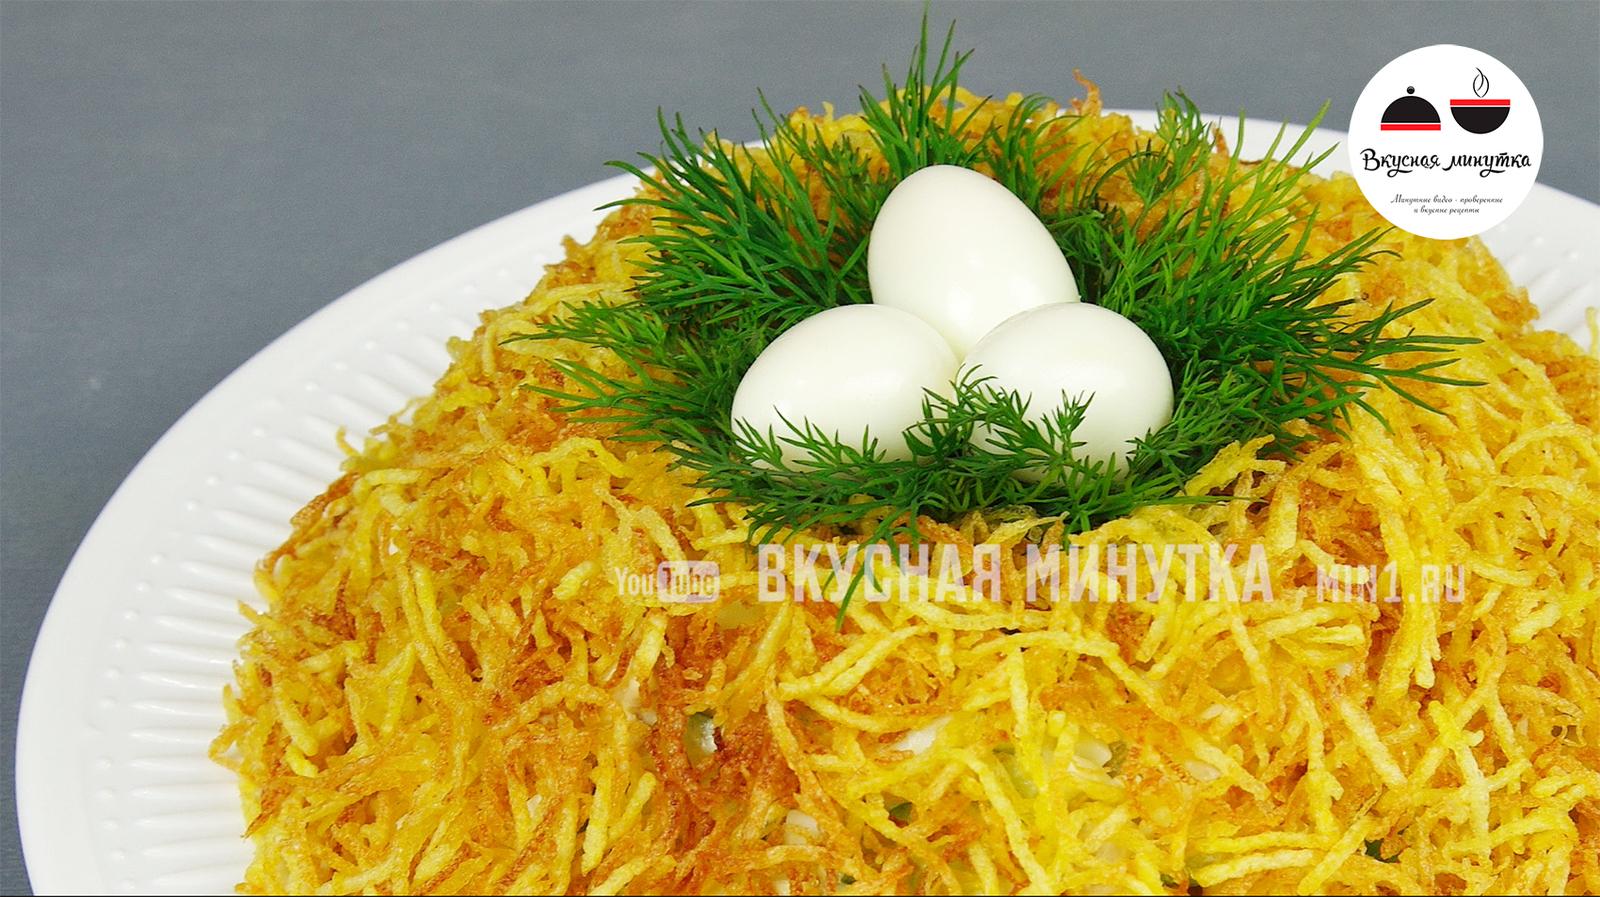 гнездо глухаря салаты рецепты с фото